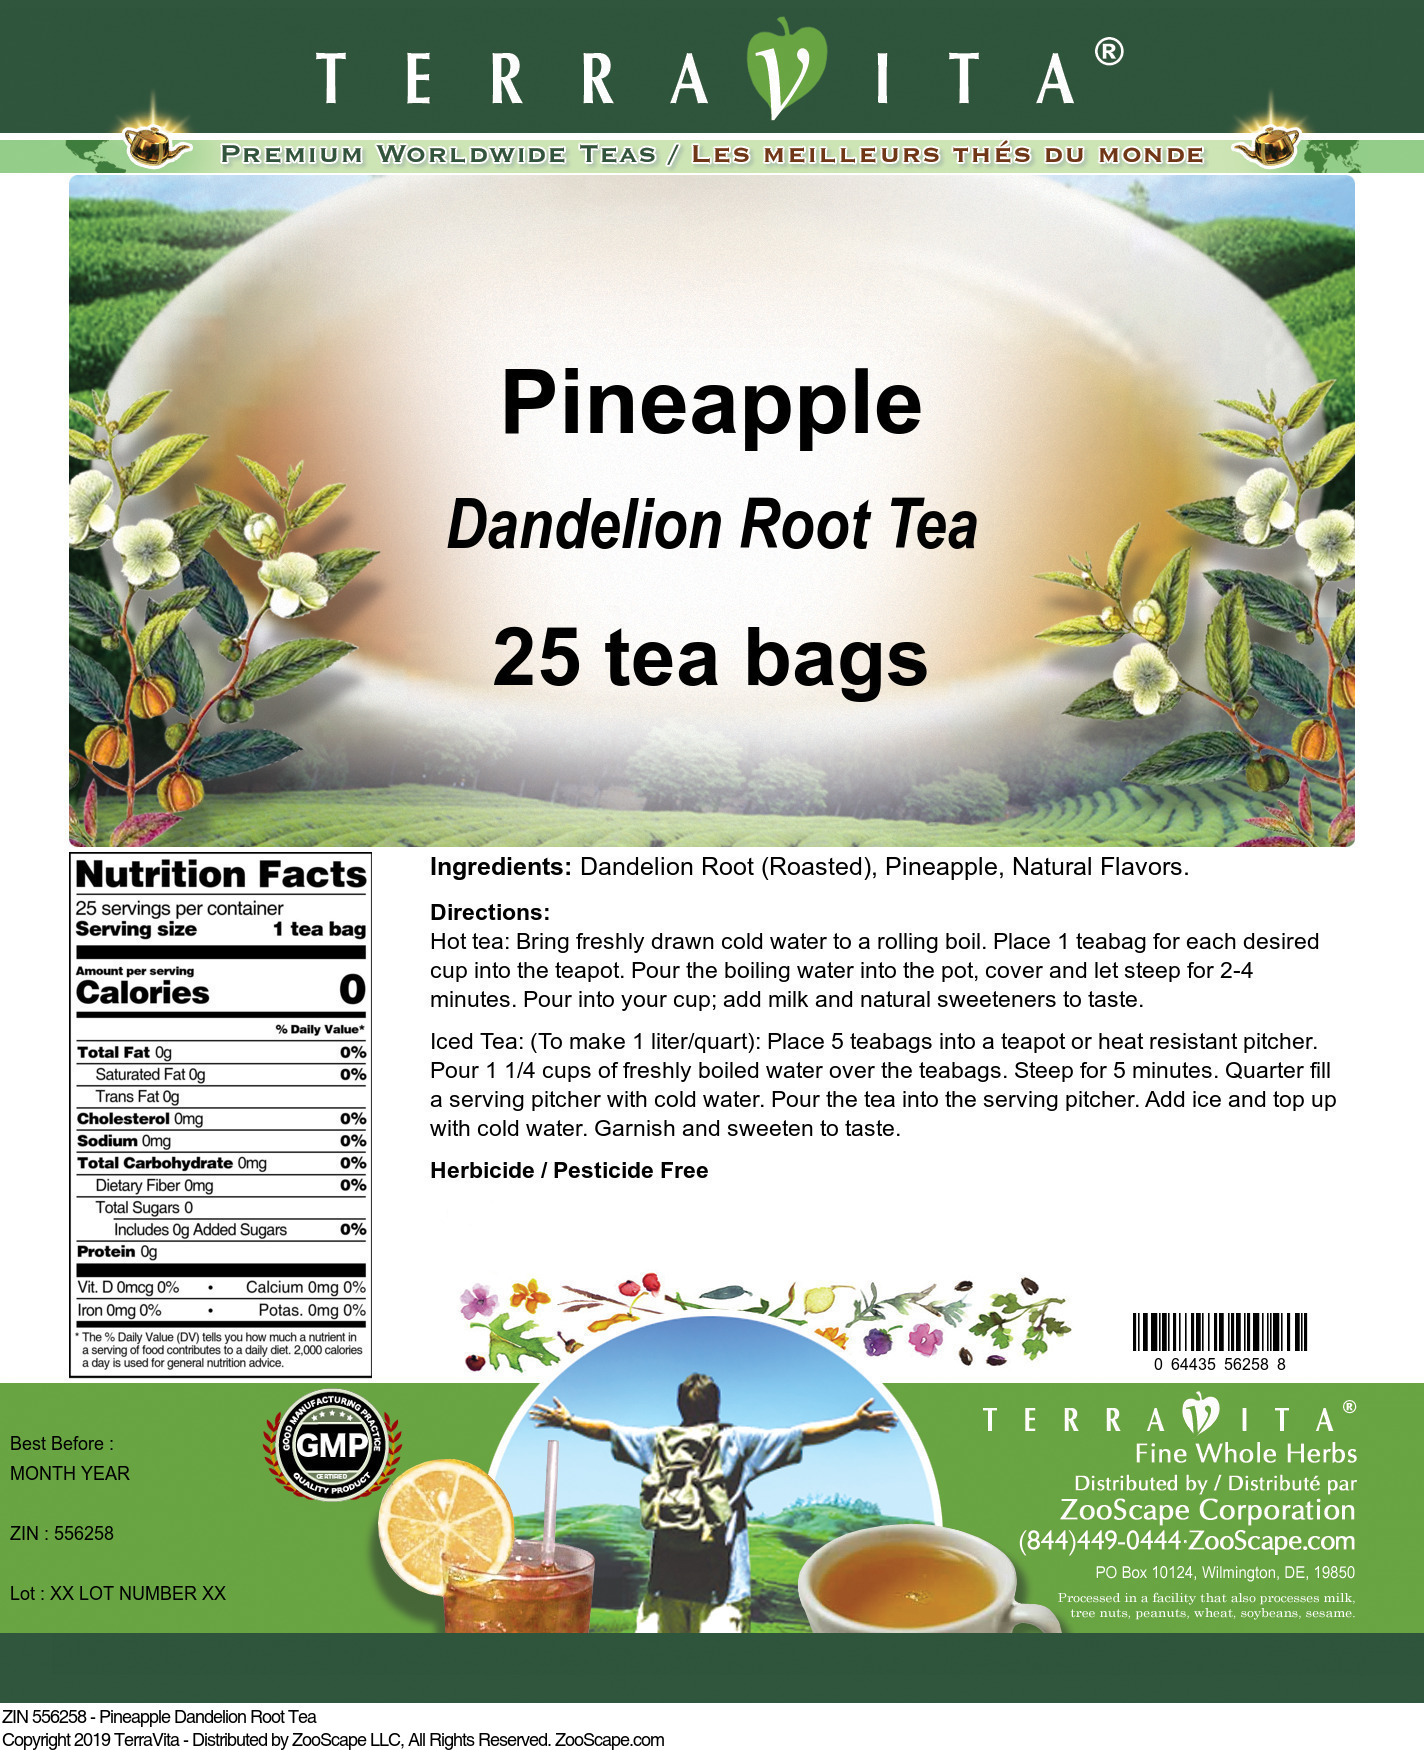 Pineapple Dandelion Root Tea